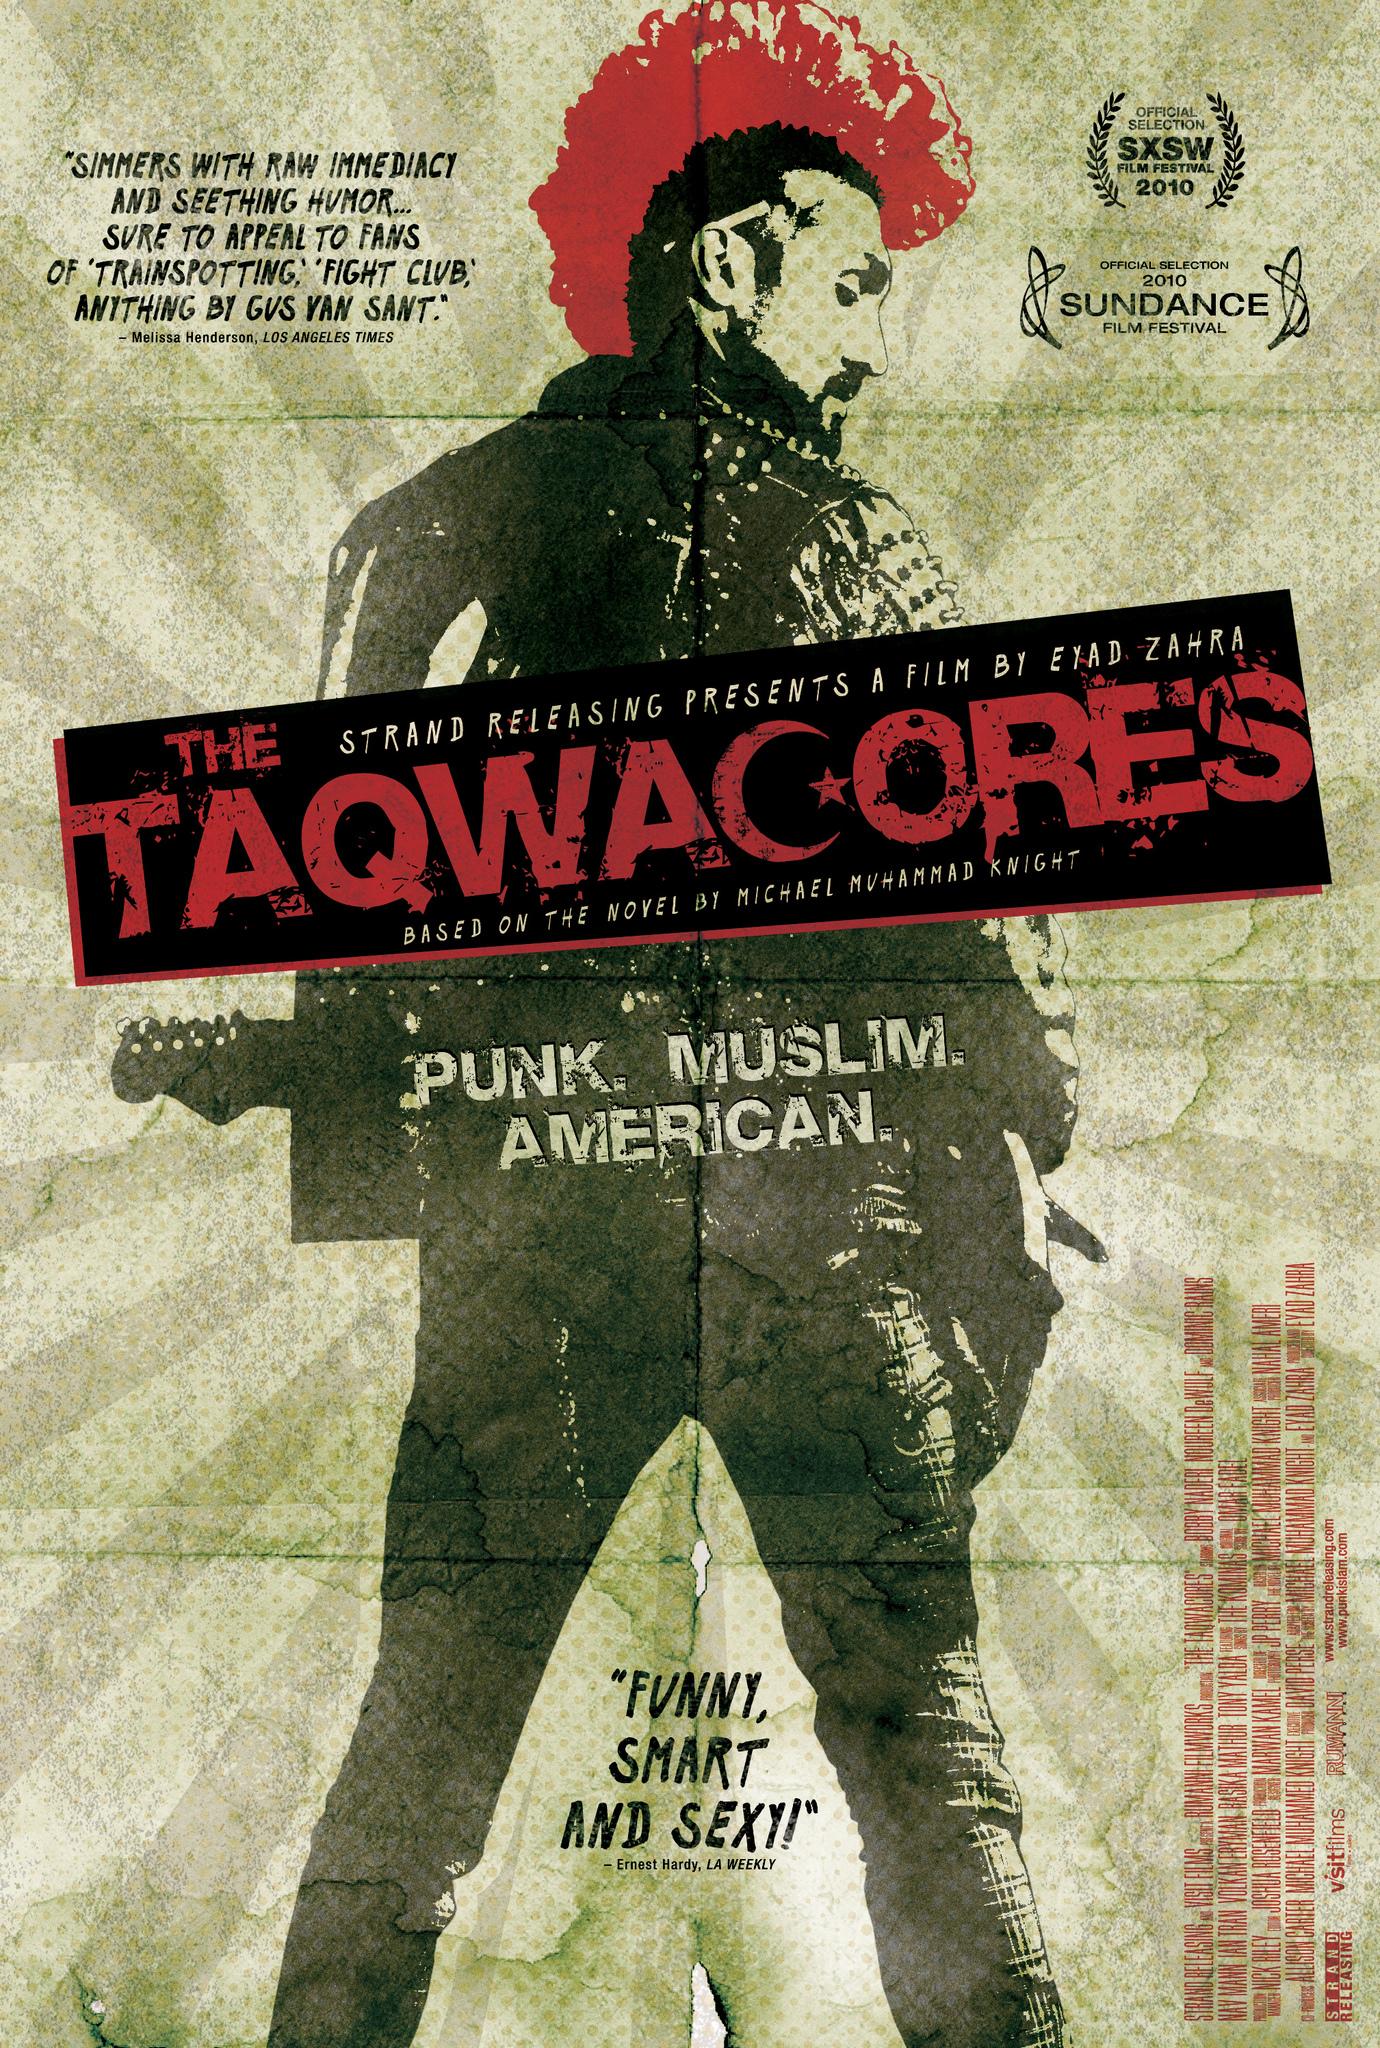 taqwacore documentary